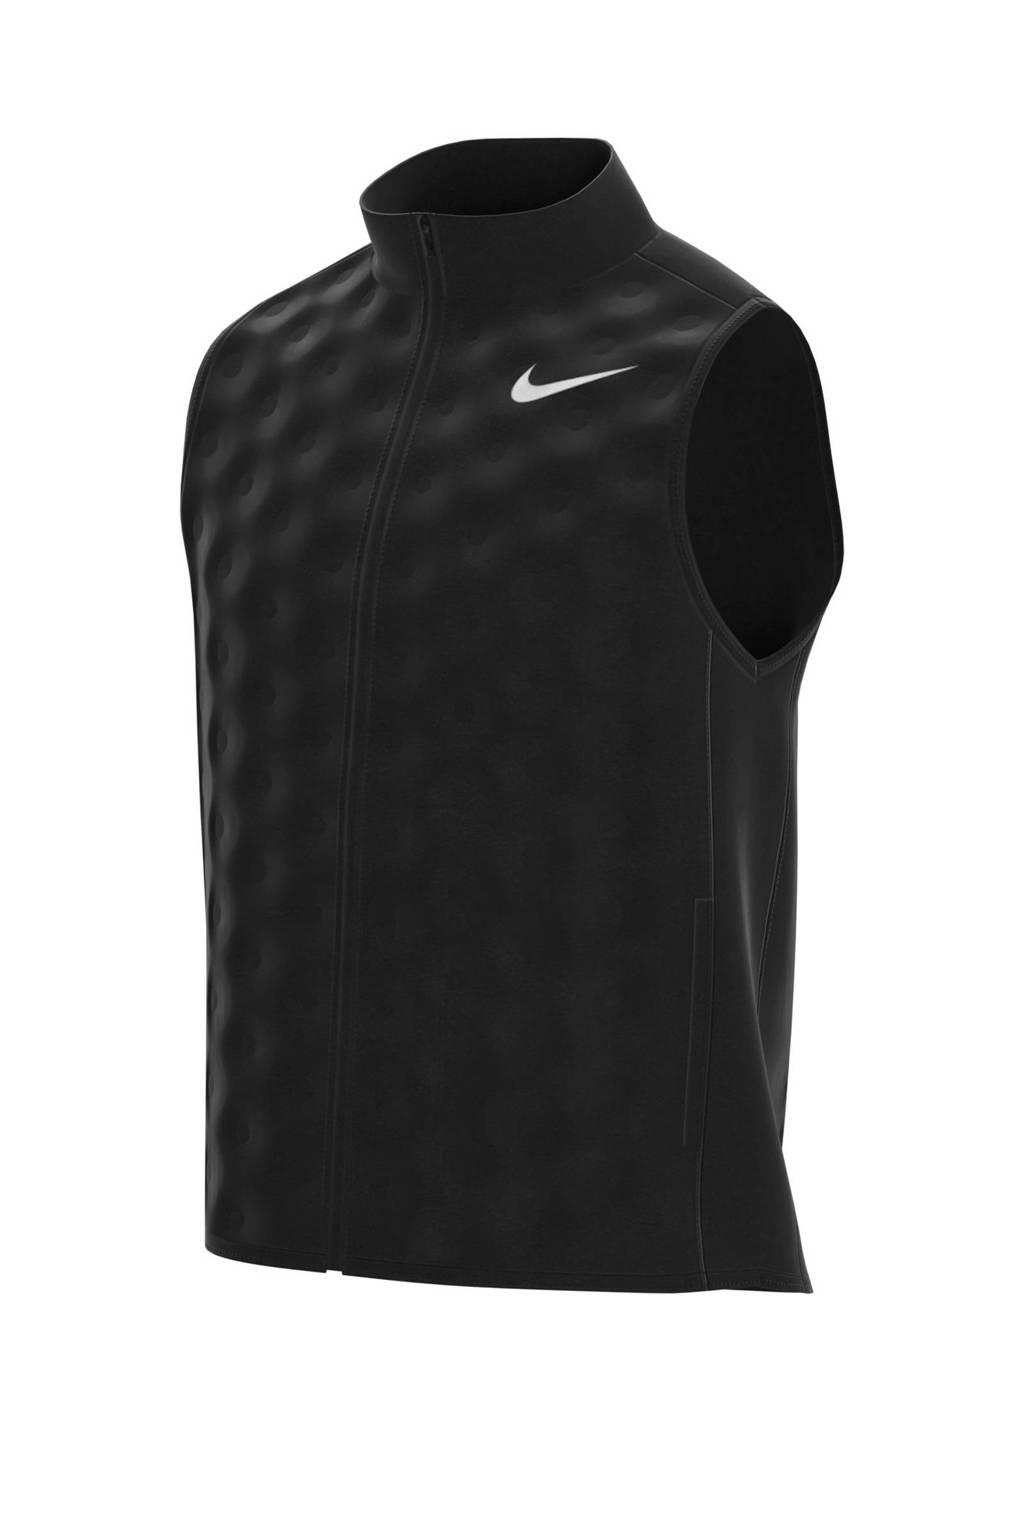 Nike   sport bodywarmer zwart, Zwart